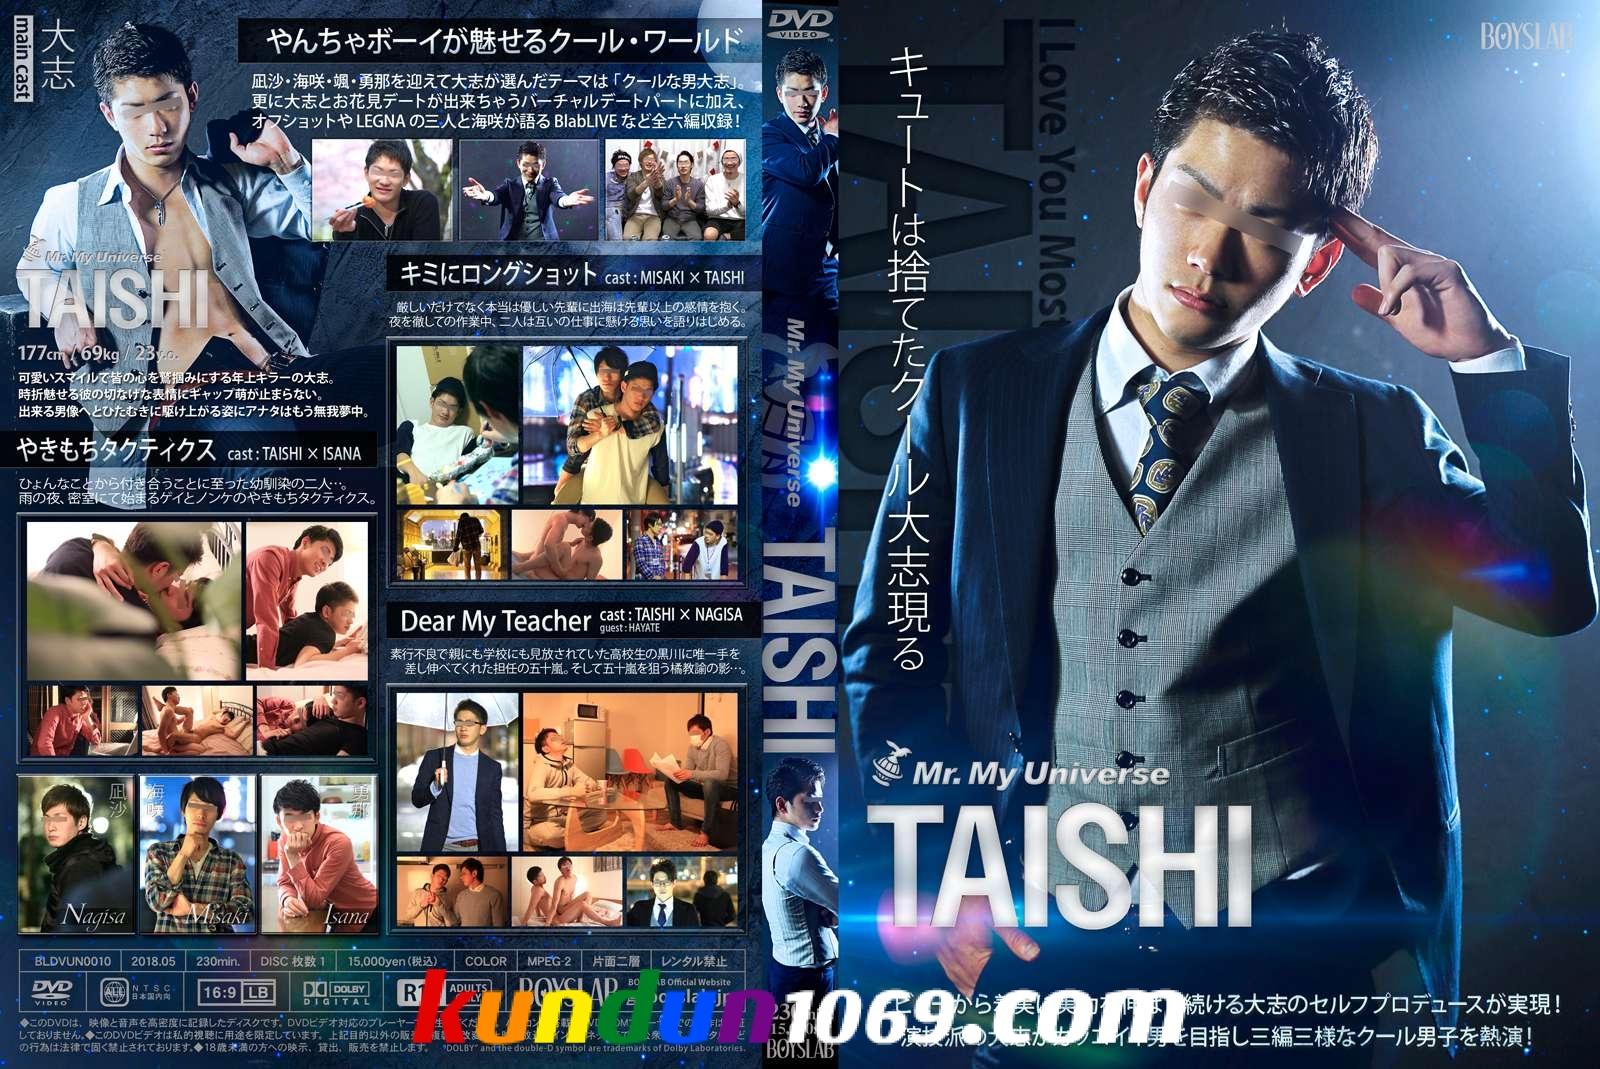 [BOYSLAB] MR. MY UNIVERSE TAISHI